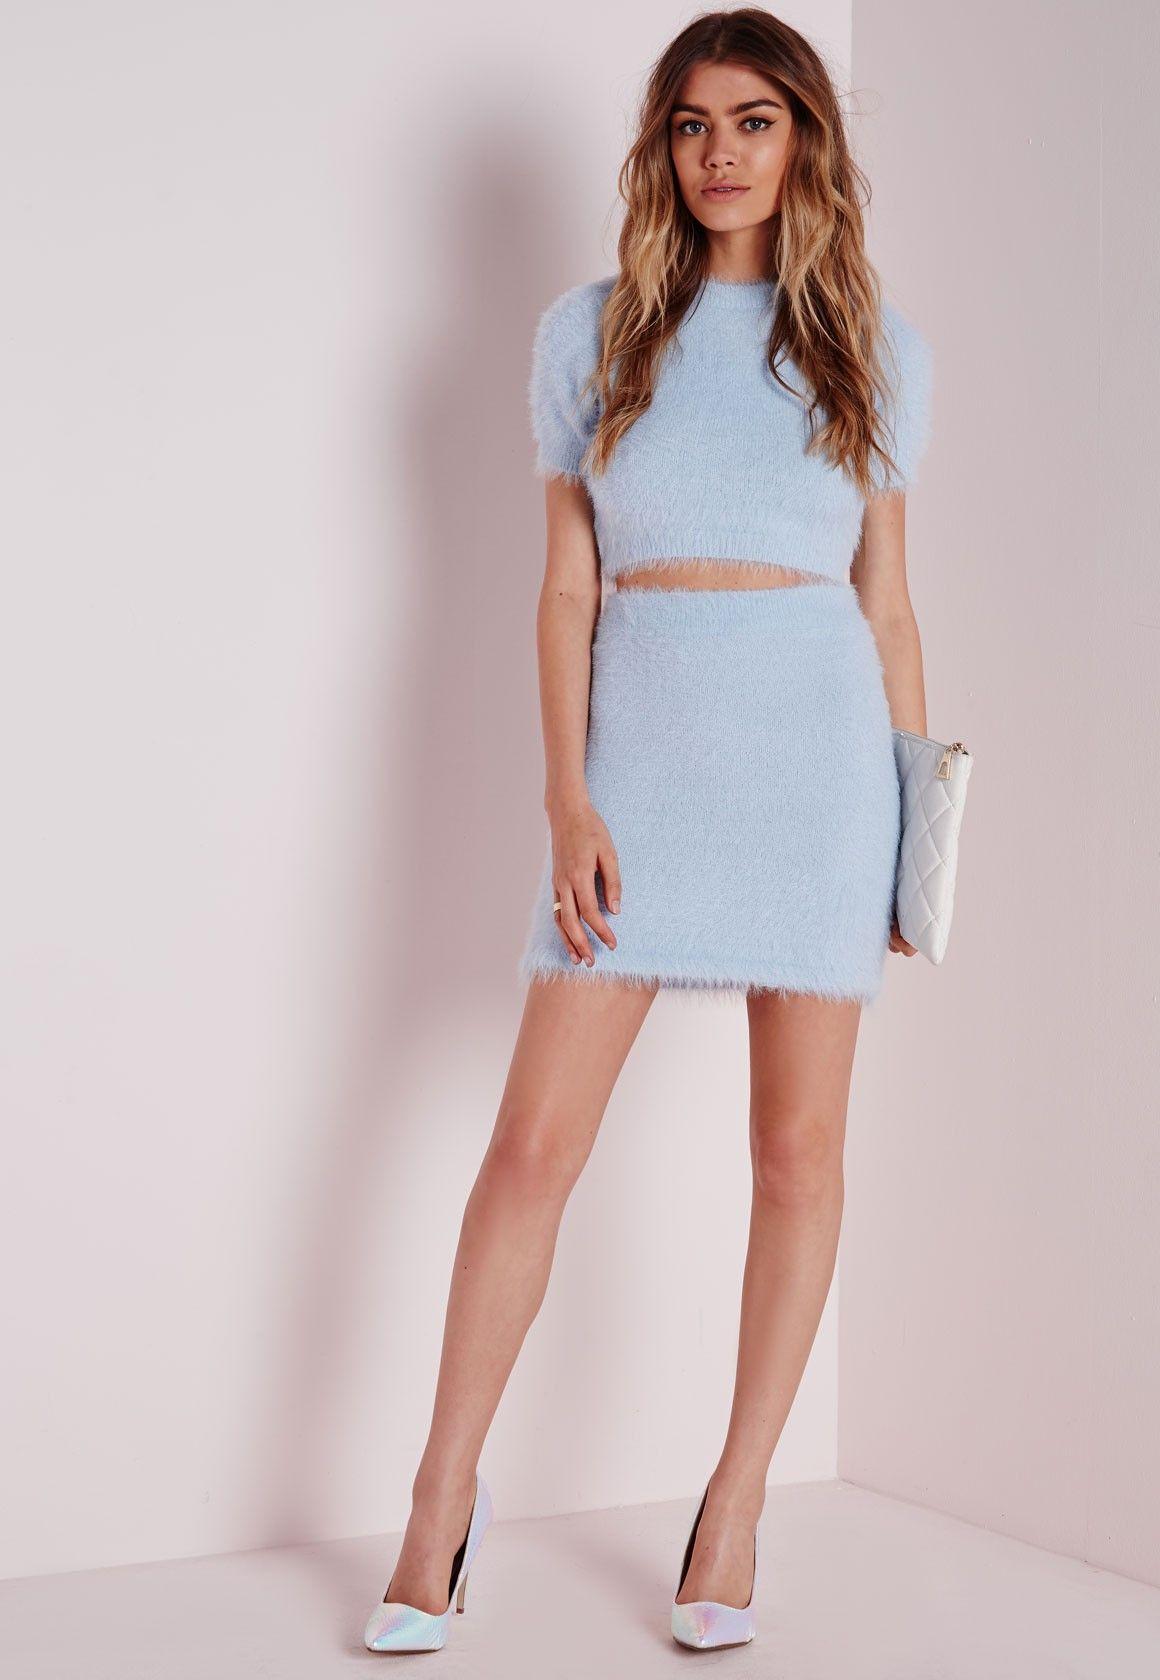 99dd0d6a10c Fluffy Mini Skirt Blue - Co-ordinates - Knitted Co-ordinates ...